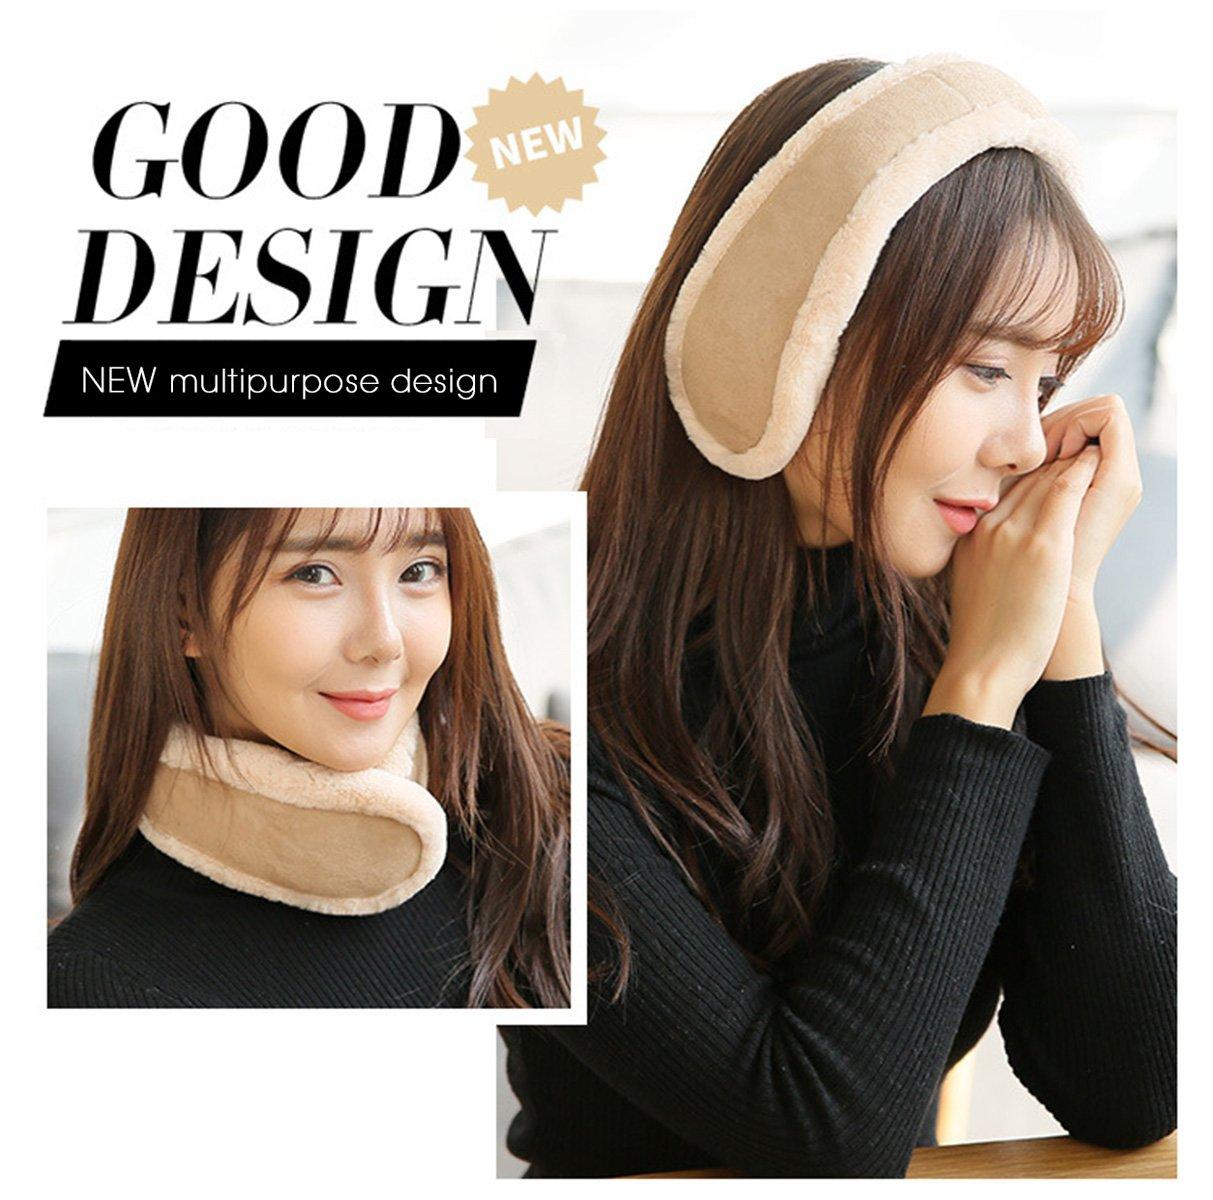 Knolee NEW Unisex Multi-function Earmuffs Earflap Foldable Outdoor Ear Muffs,Beige One Size by Knolee (Image #2)